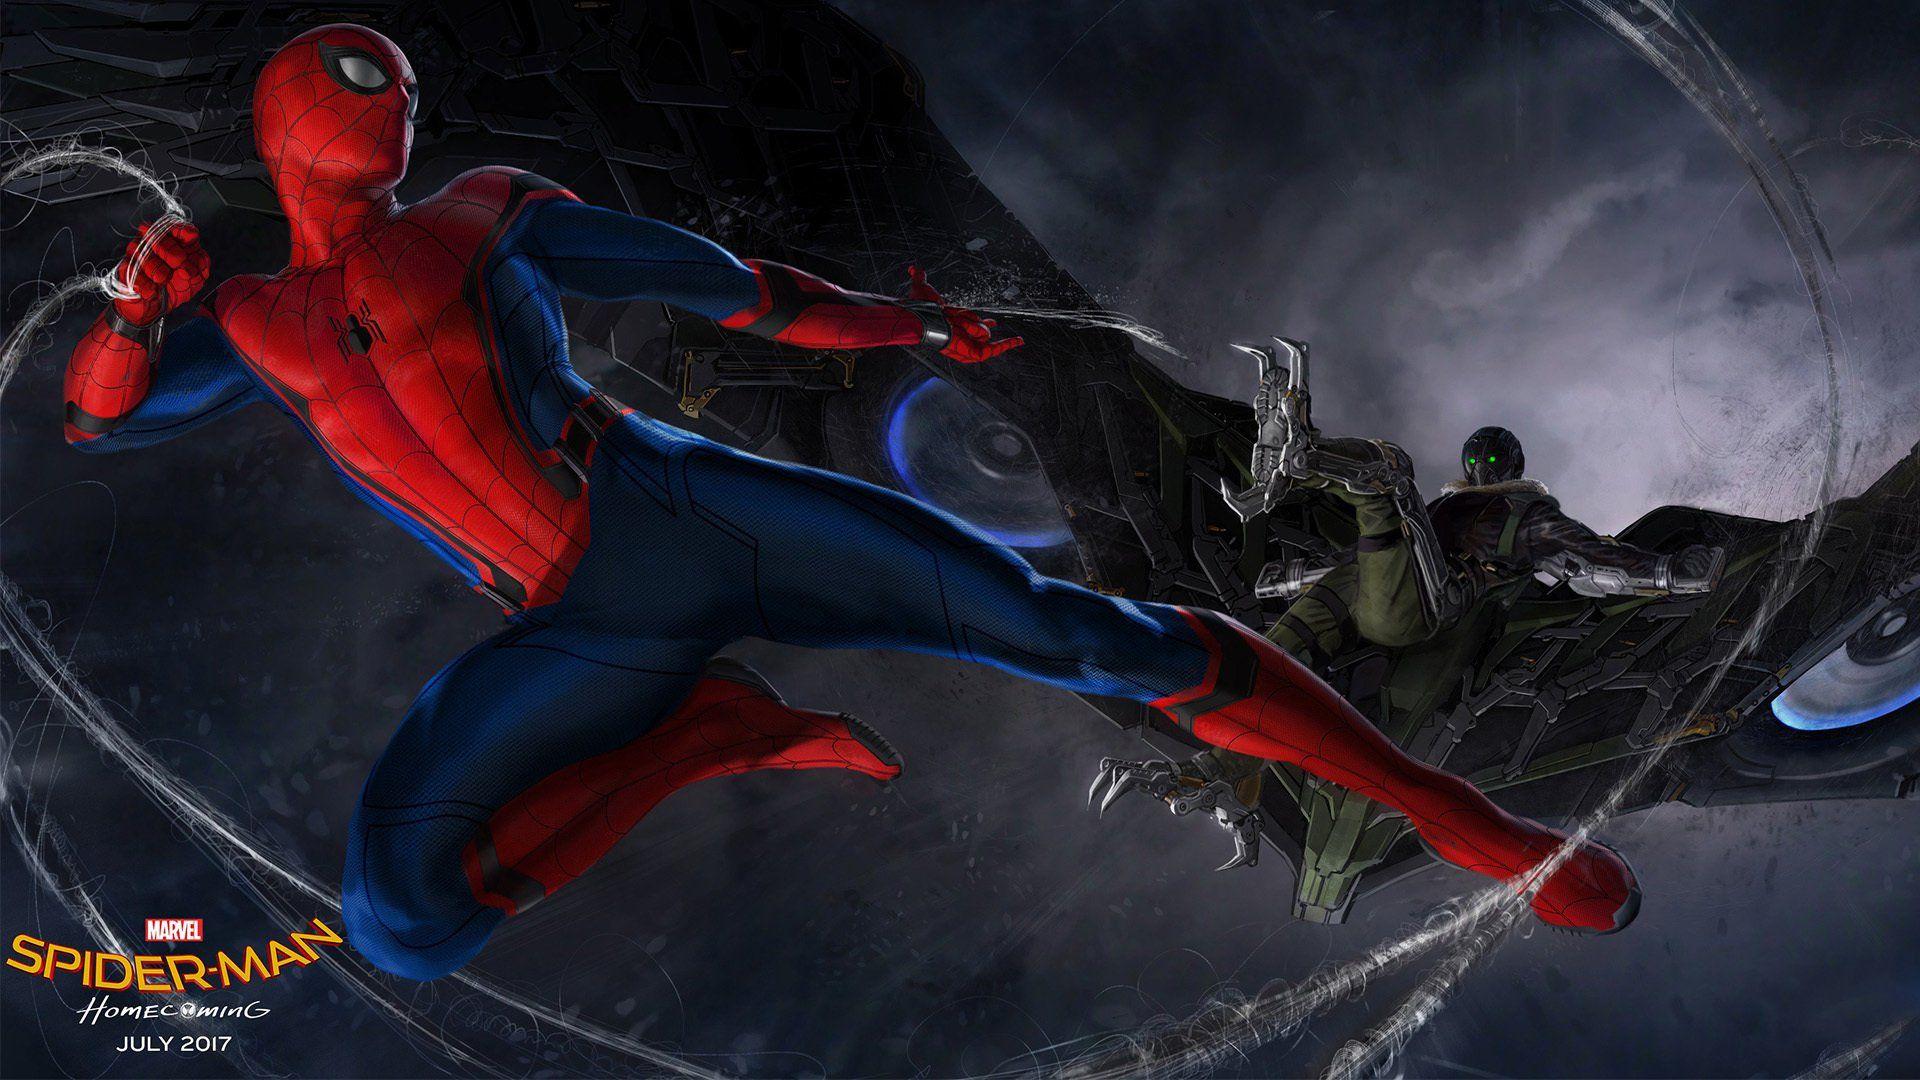 Spider-Man: Homecoming - Itvmovie